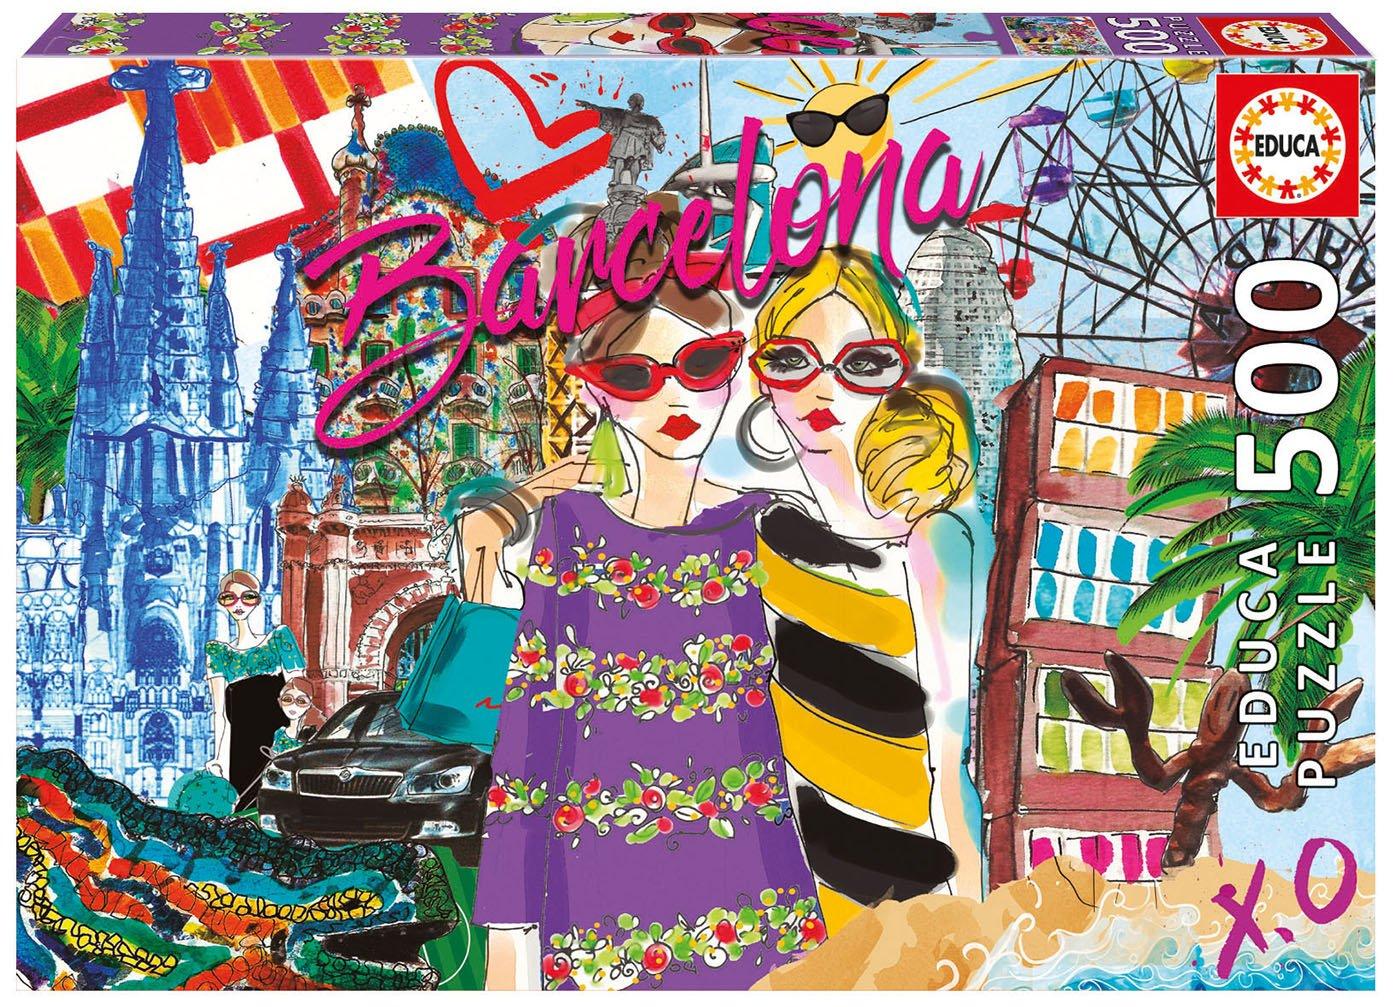 Educa 17651 World - Take me Take to Puzzle Barcelona - 500 pieces - Chic World Puzzle B0793HP2S2, クラウドモーダ:acfb6511 --- ero-shop-kupidon.ru